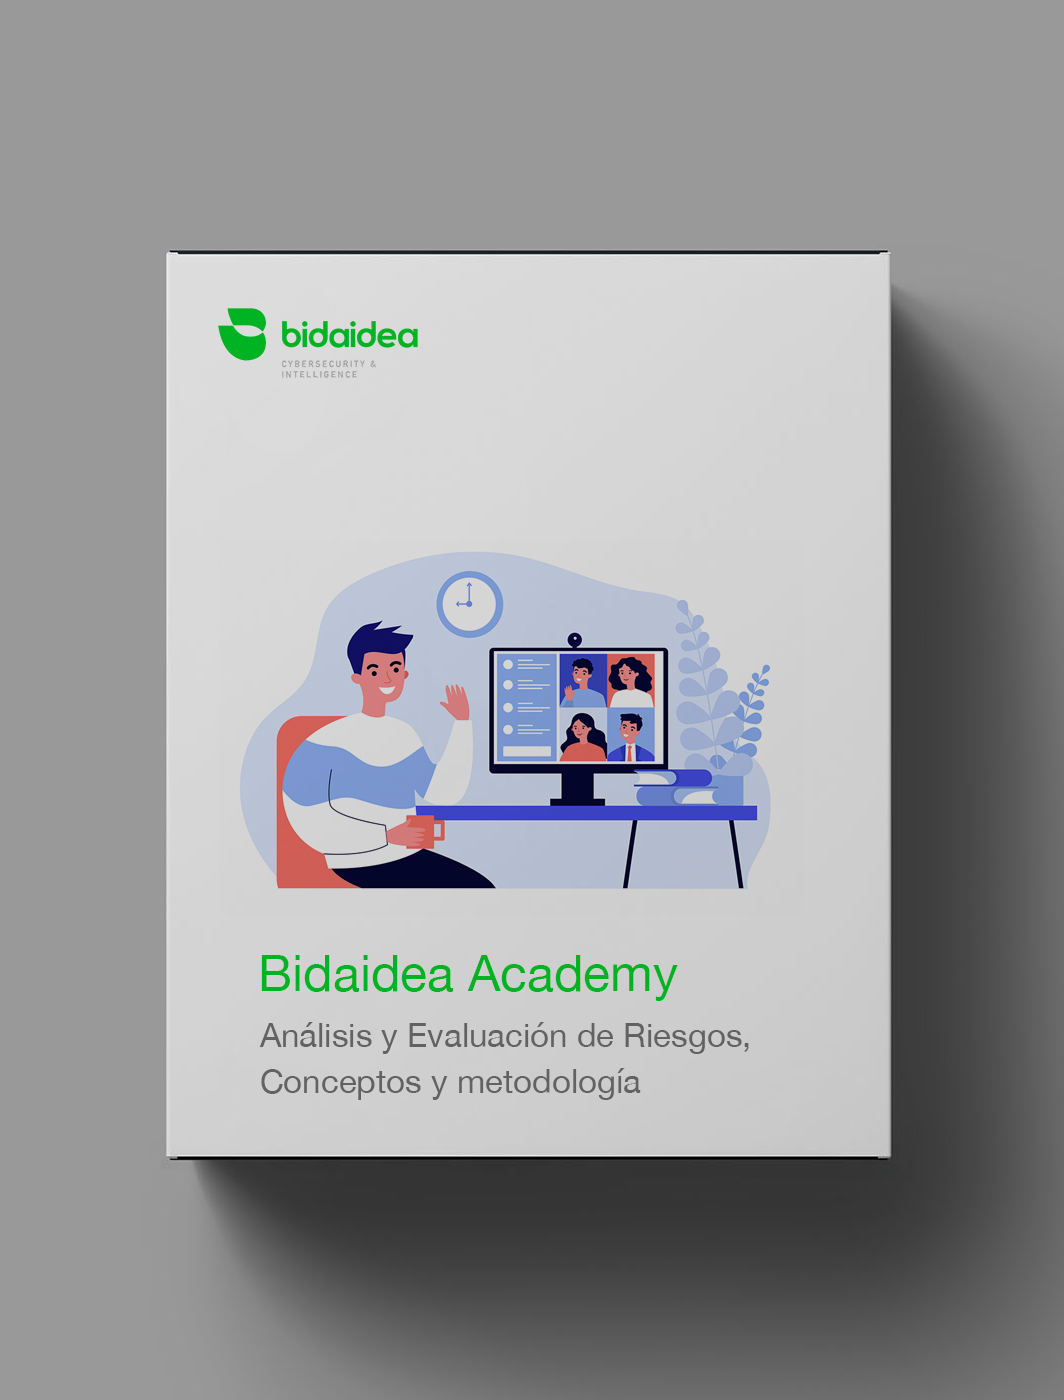 cyberpacks bidaidea academy 06 - Empresa de Ciberseguridad